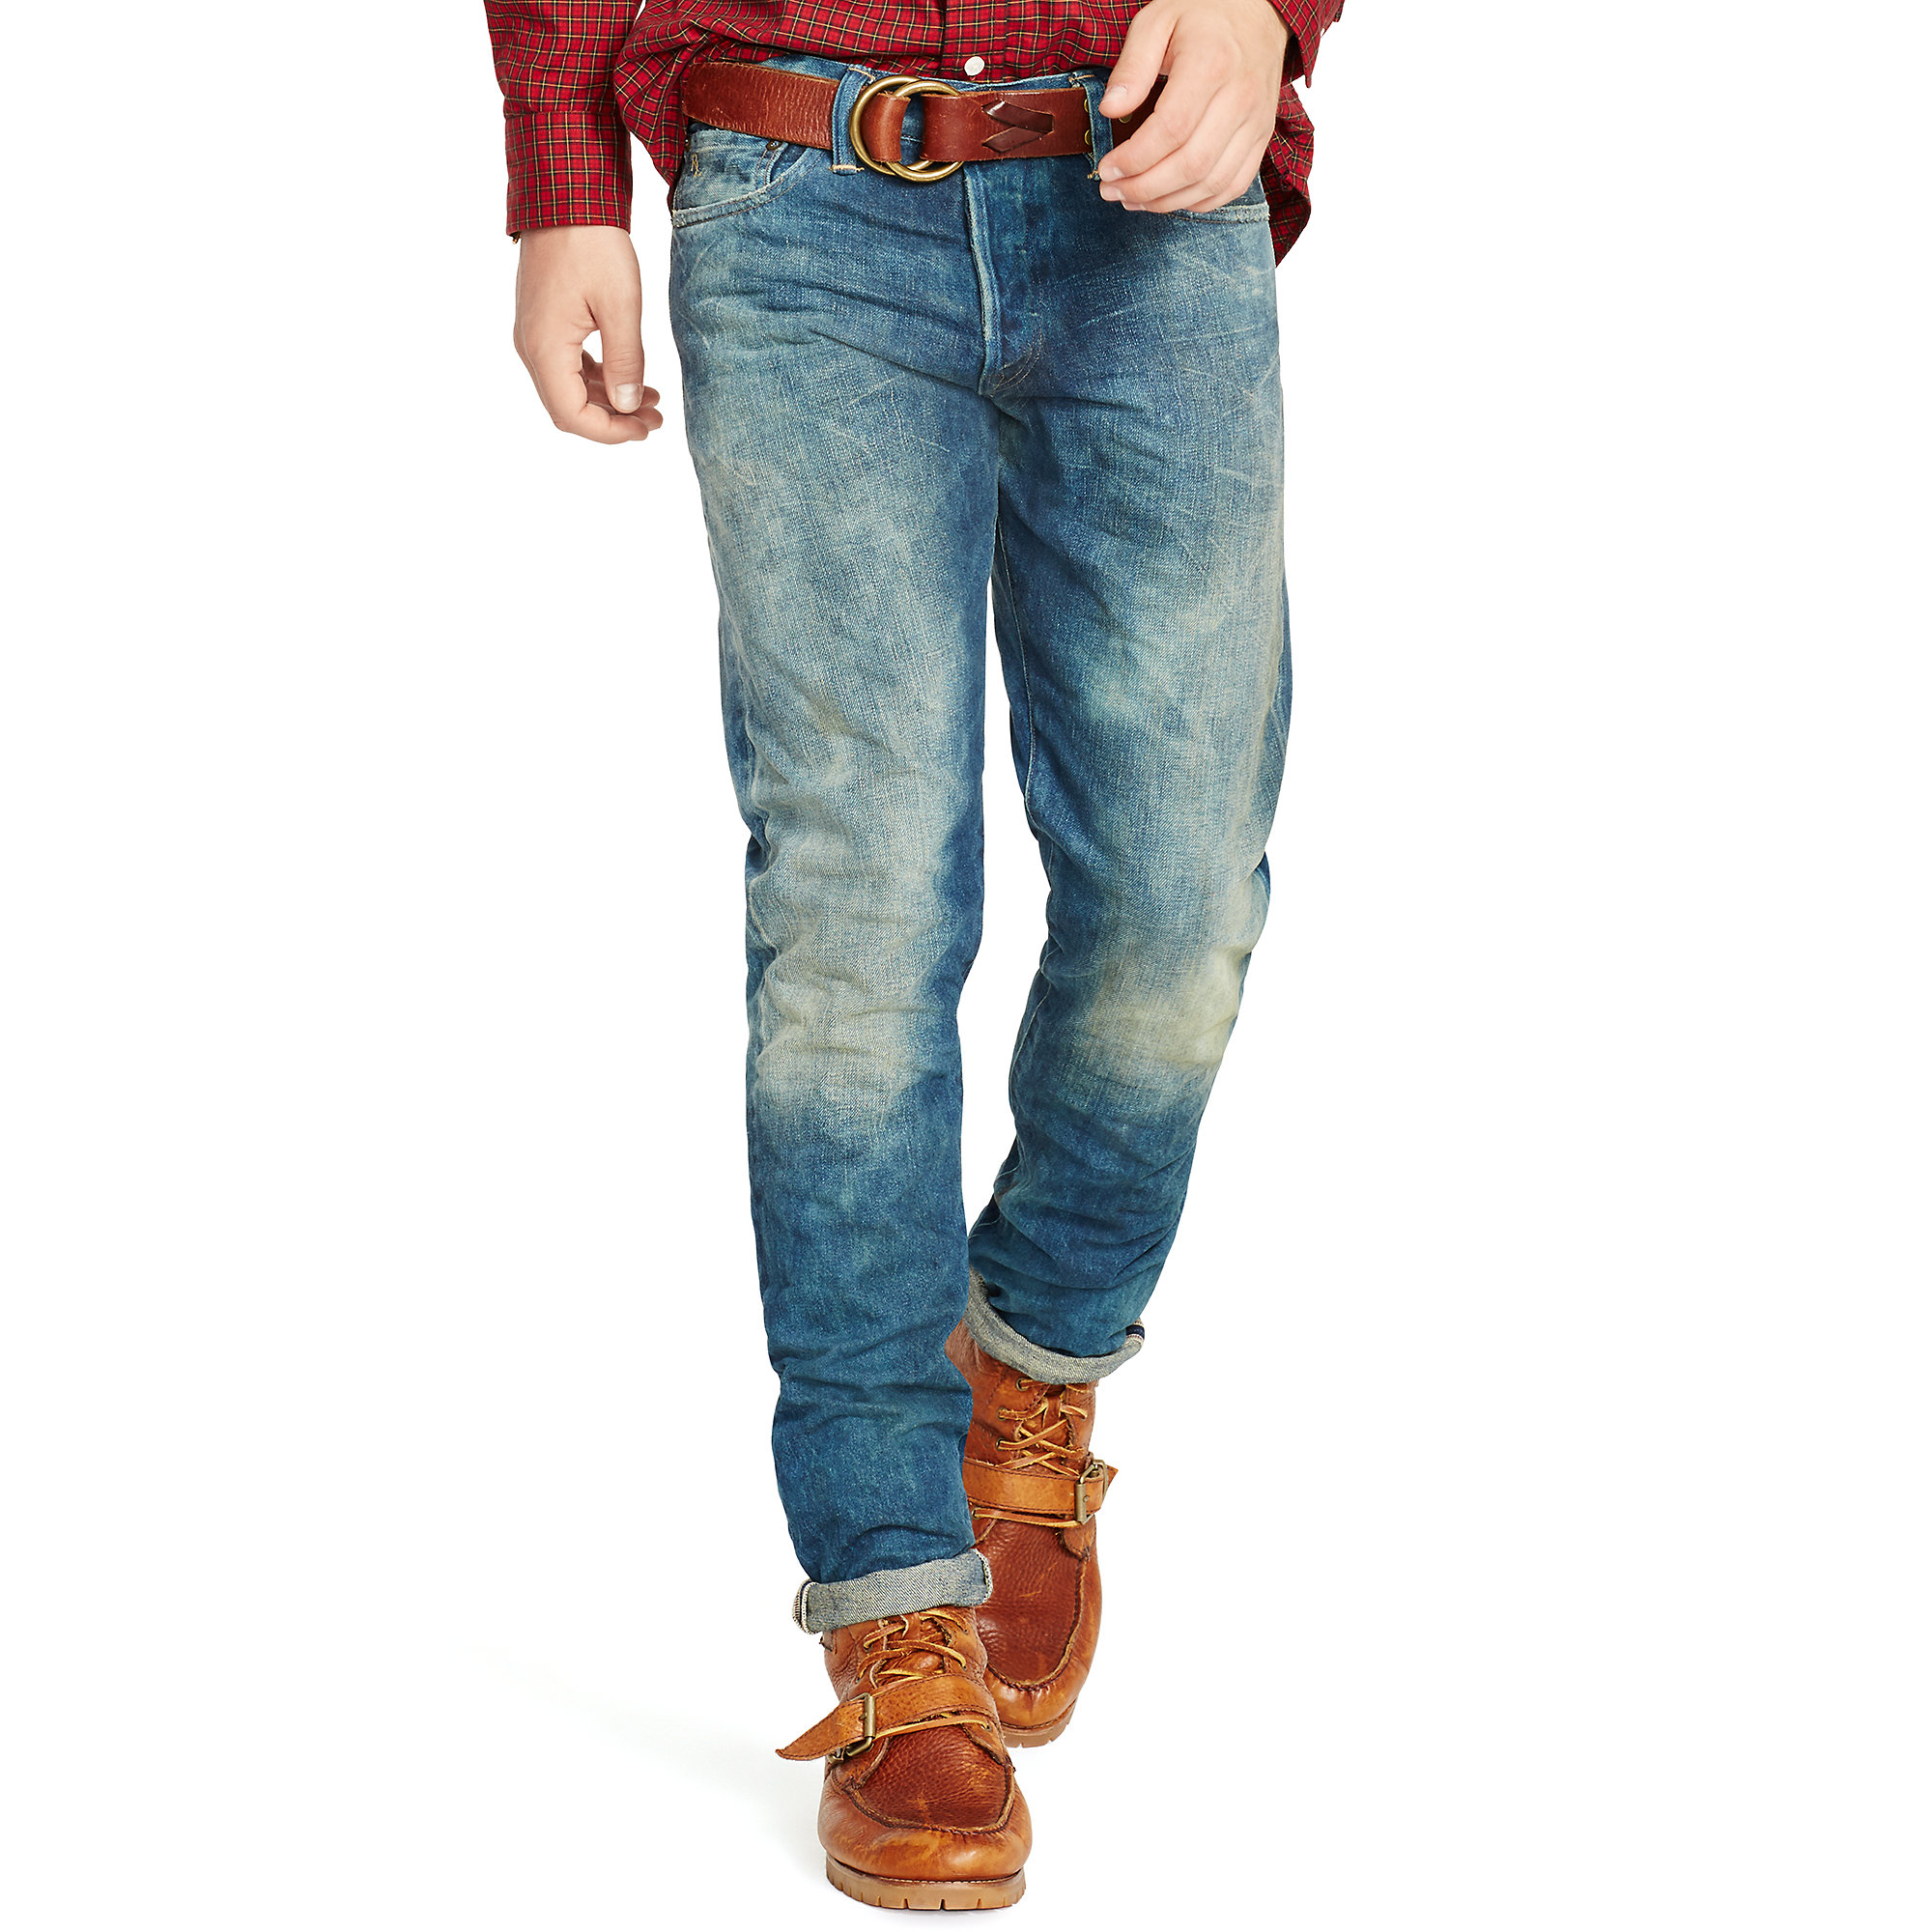 65940a6b2 Polo Ralph Lauren Sullivan Slim-fit Jean in Blue for Men - Lyst